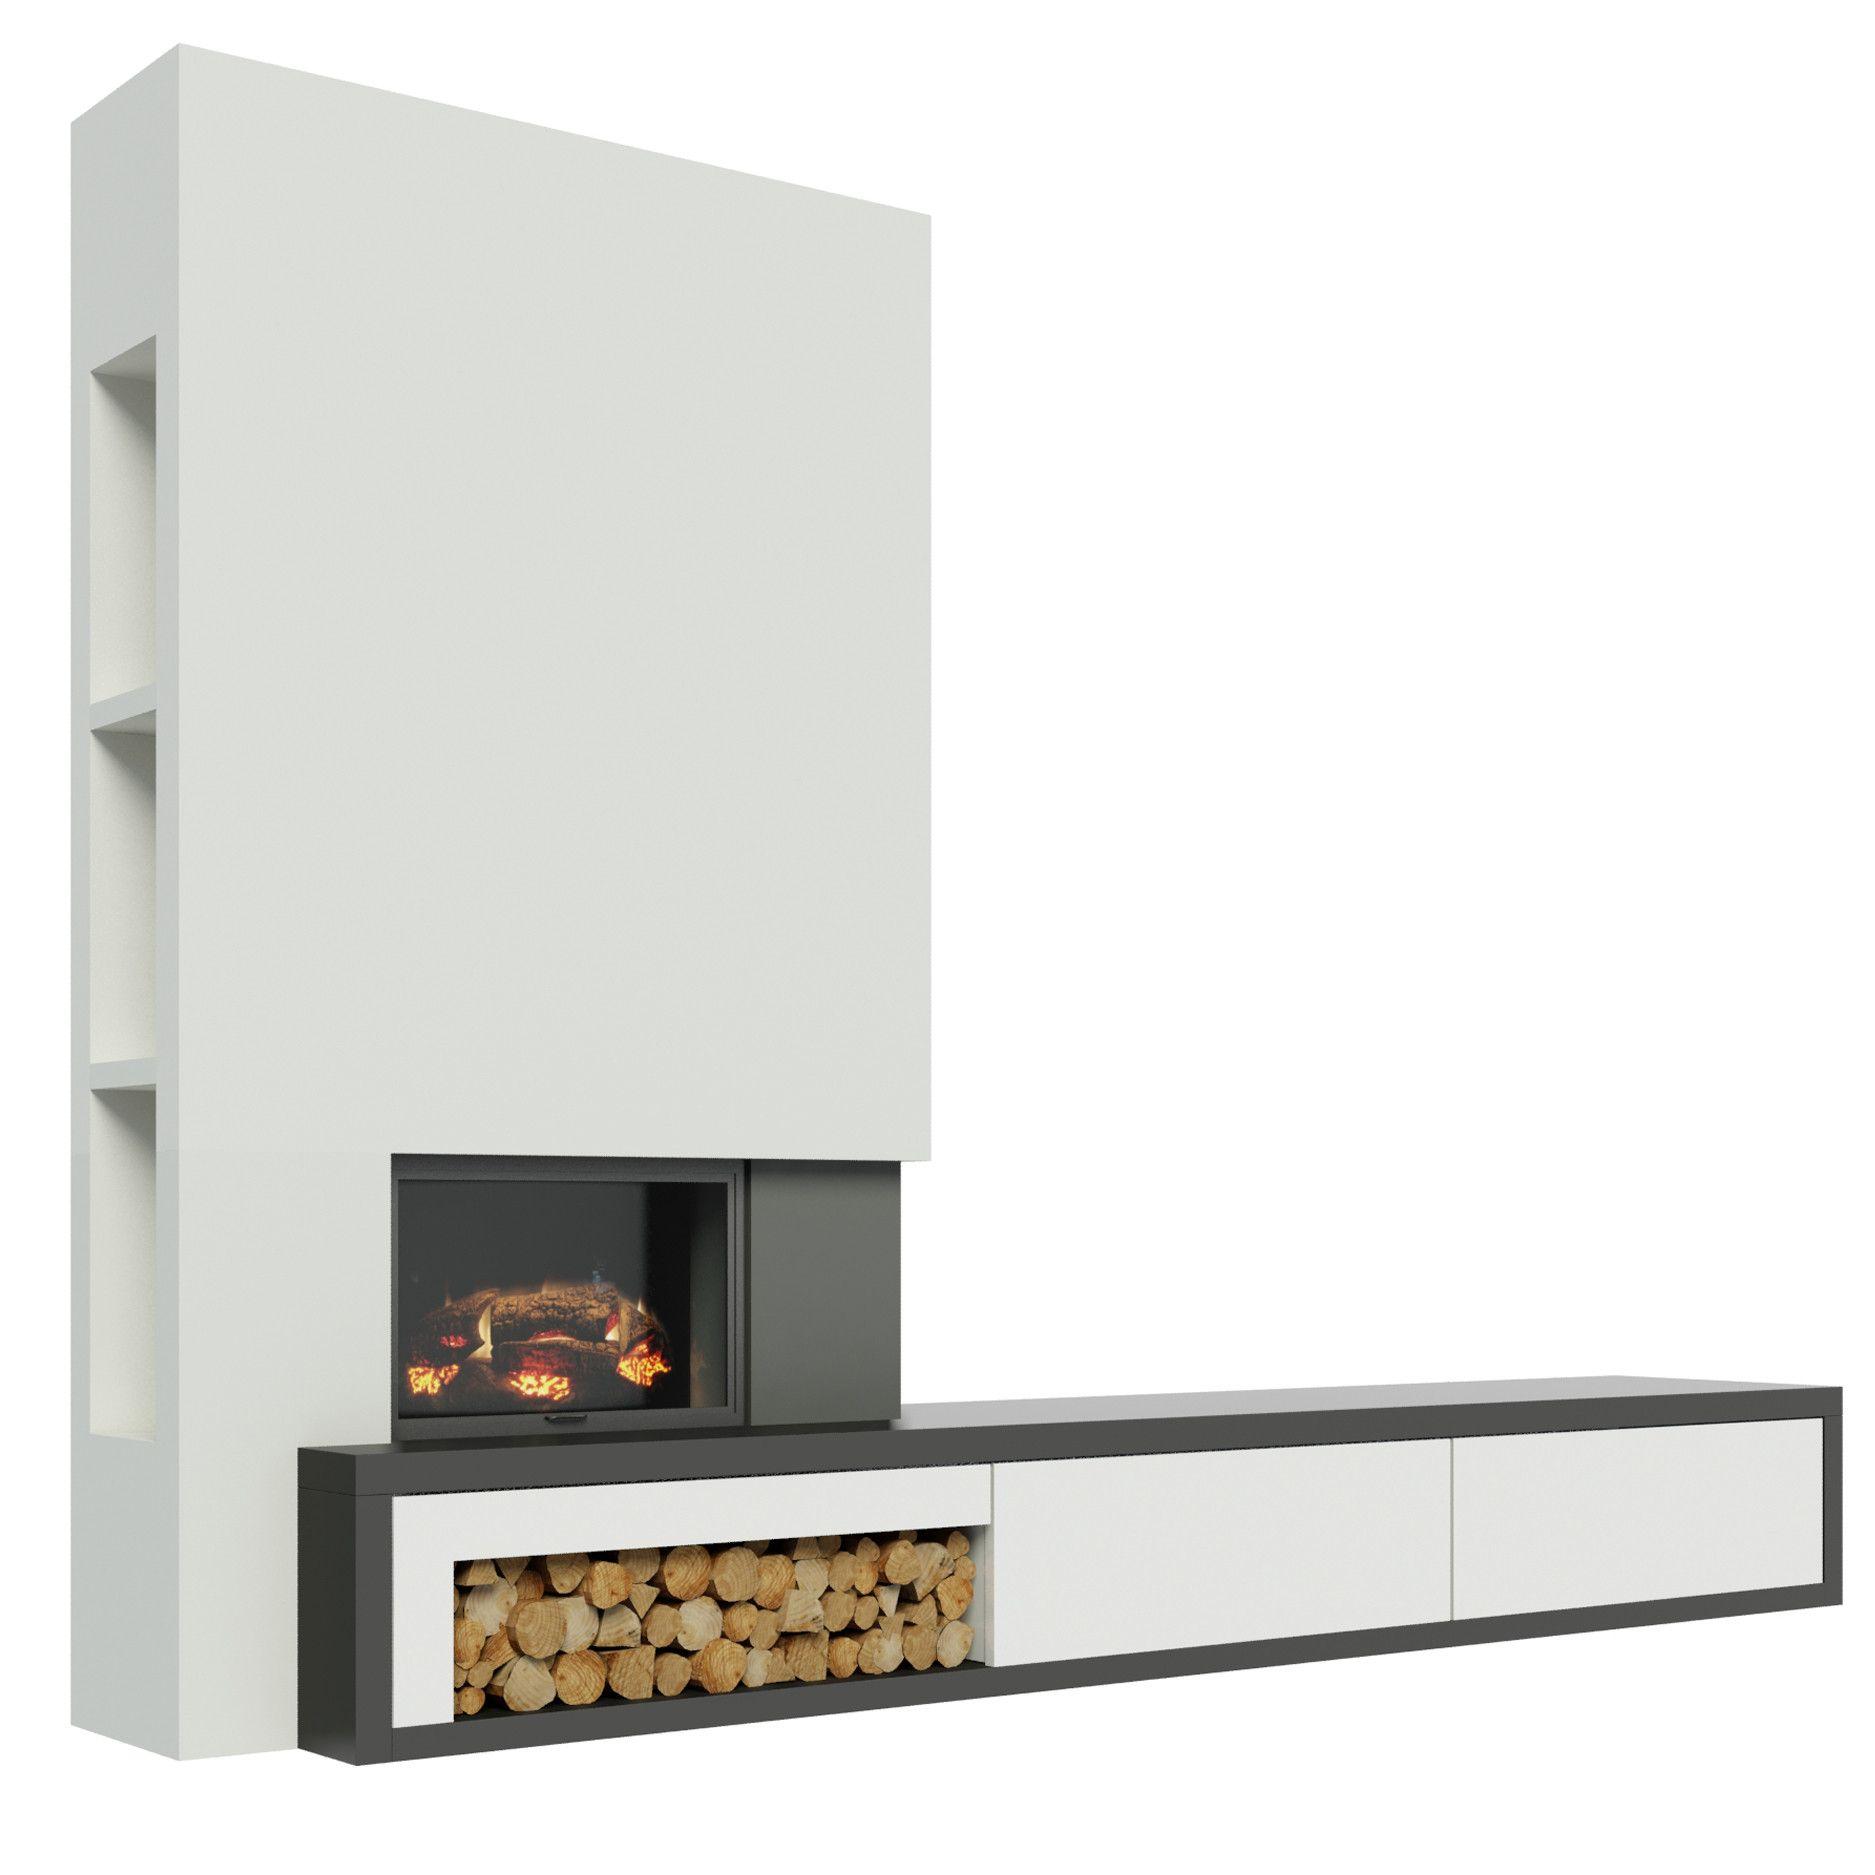 Max modern fireplace cabinet d model dmodeling pinterest